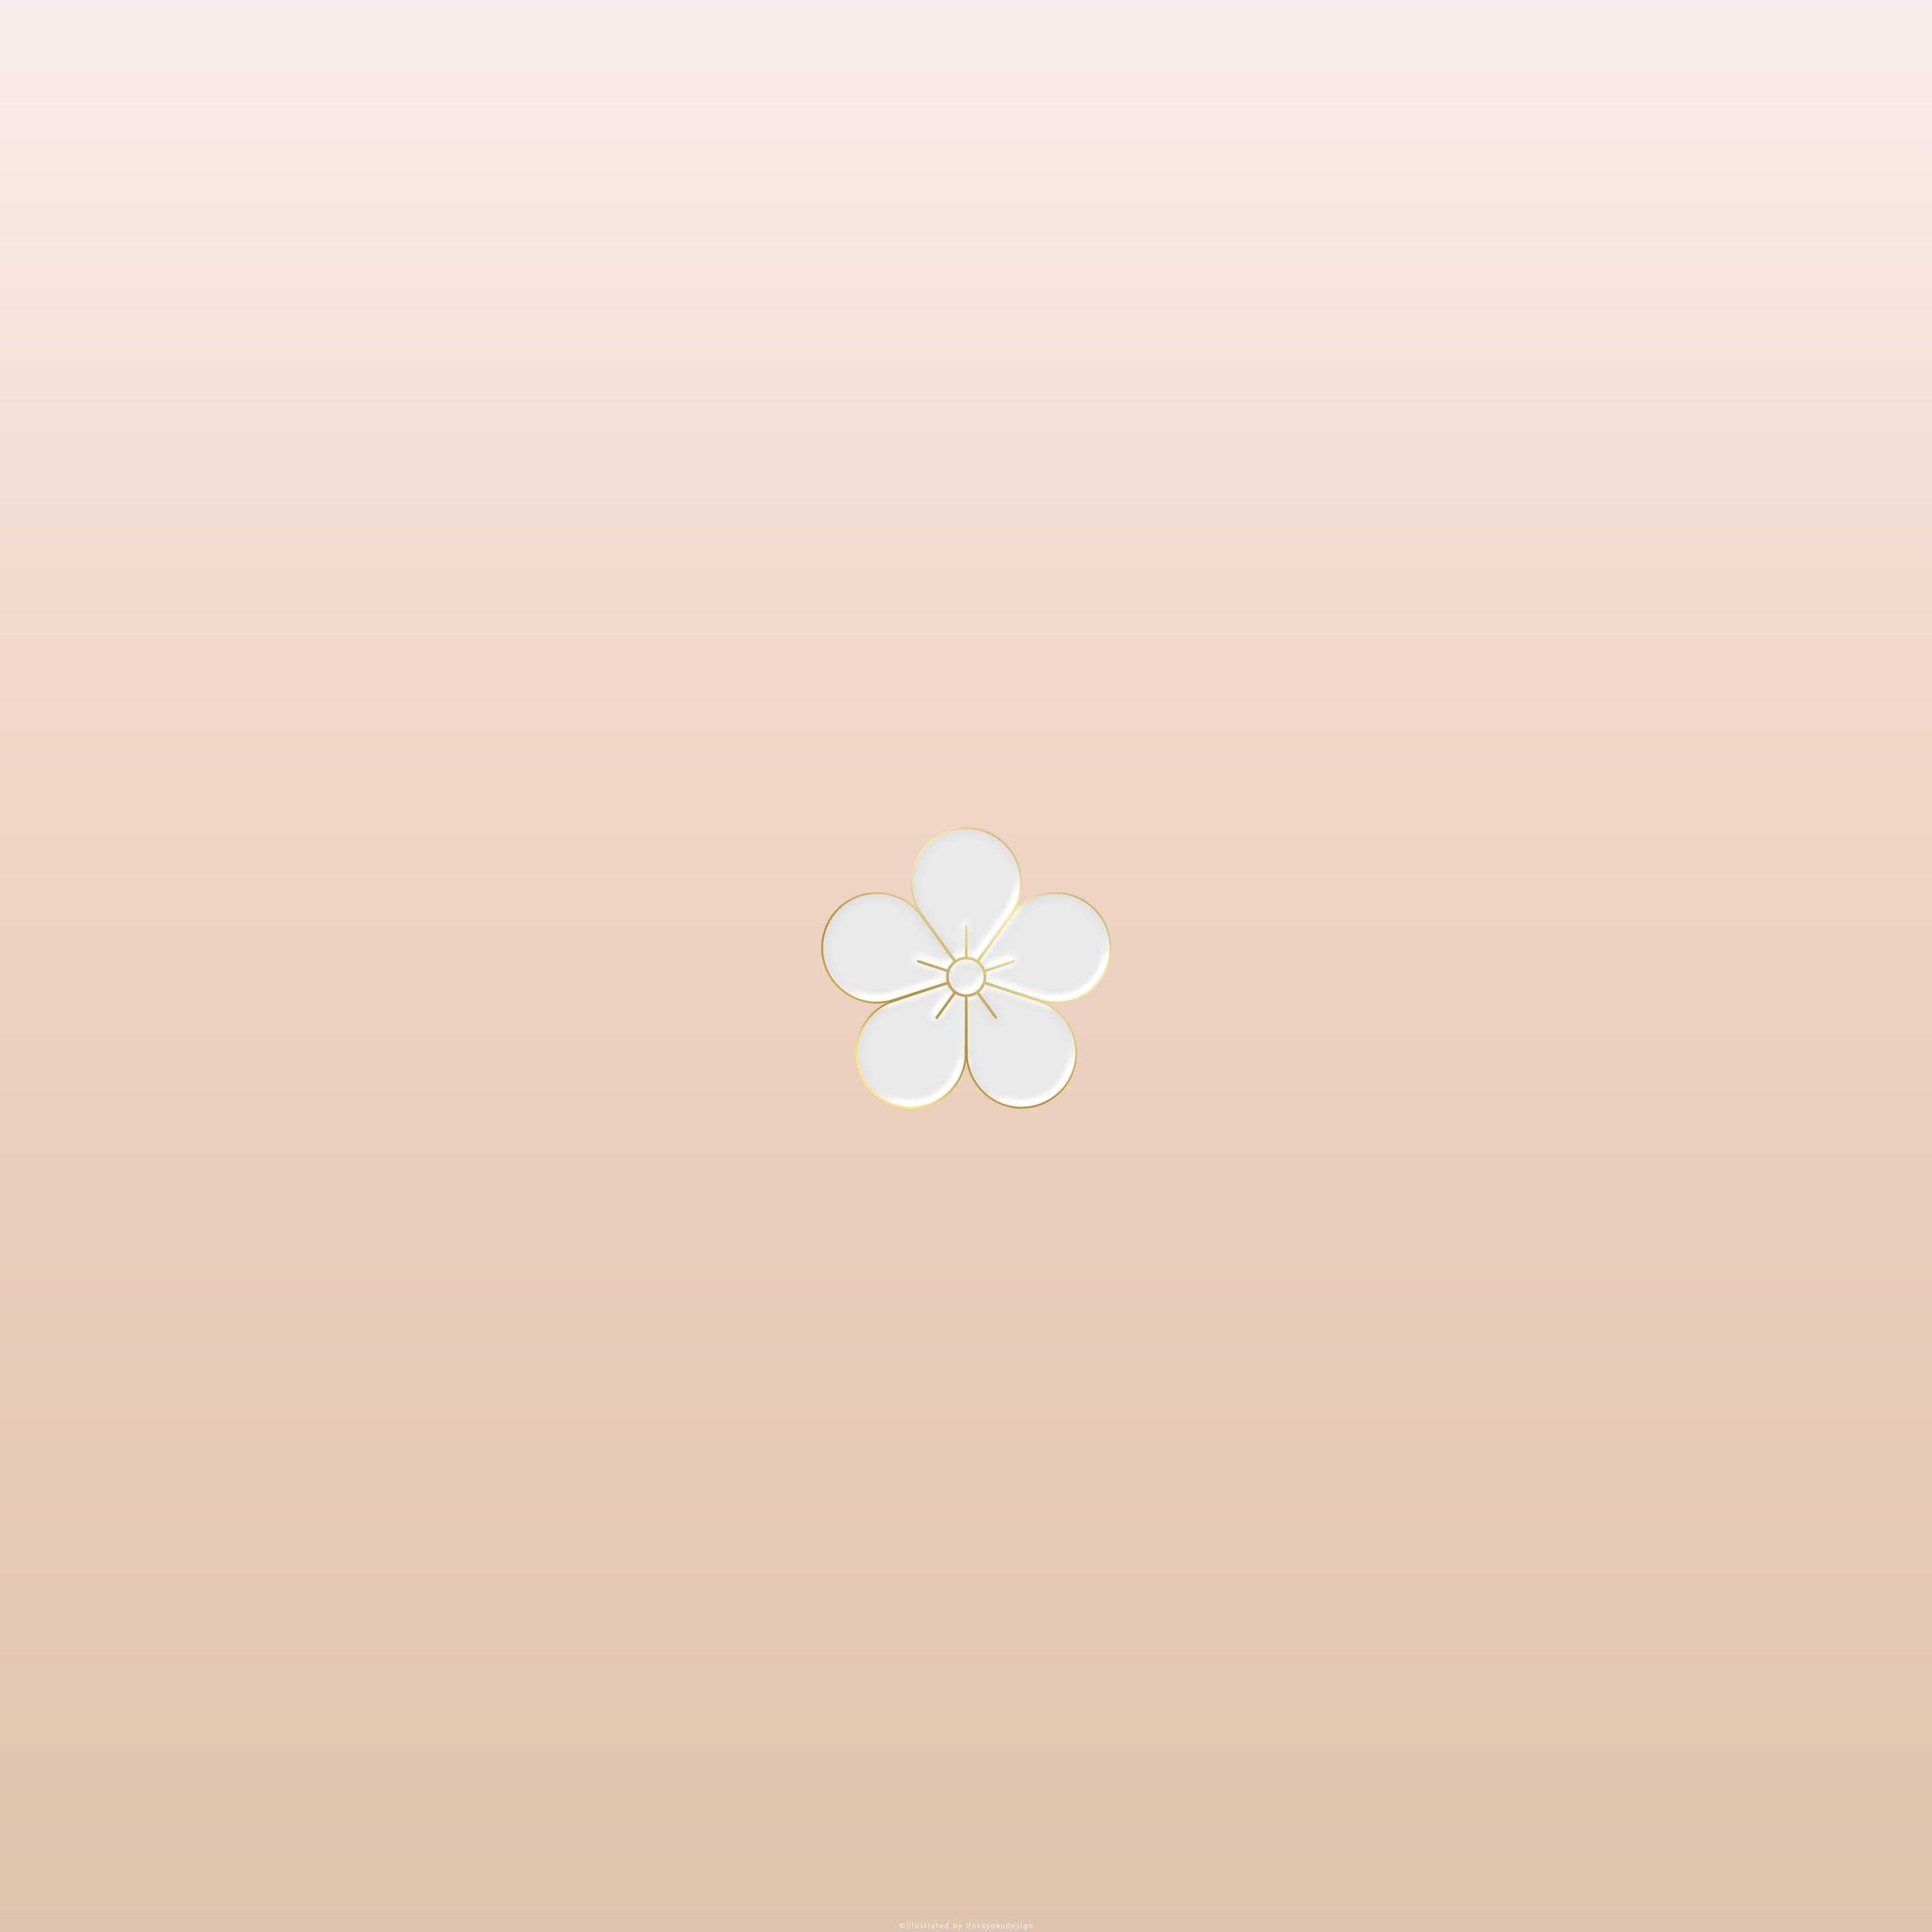 Iphone Android壁紙 梅ひとつ4 シンプルに梅をひとつ配置